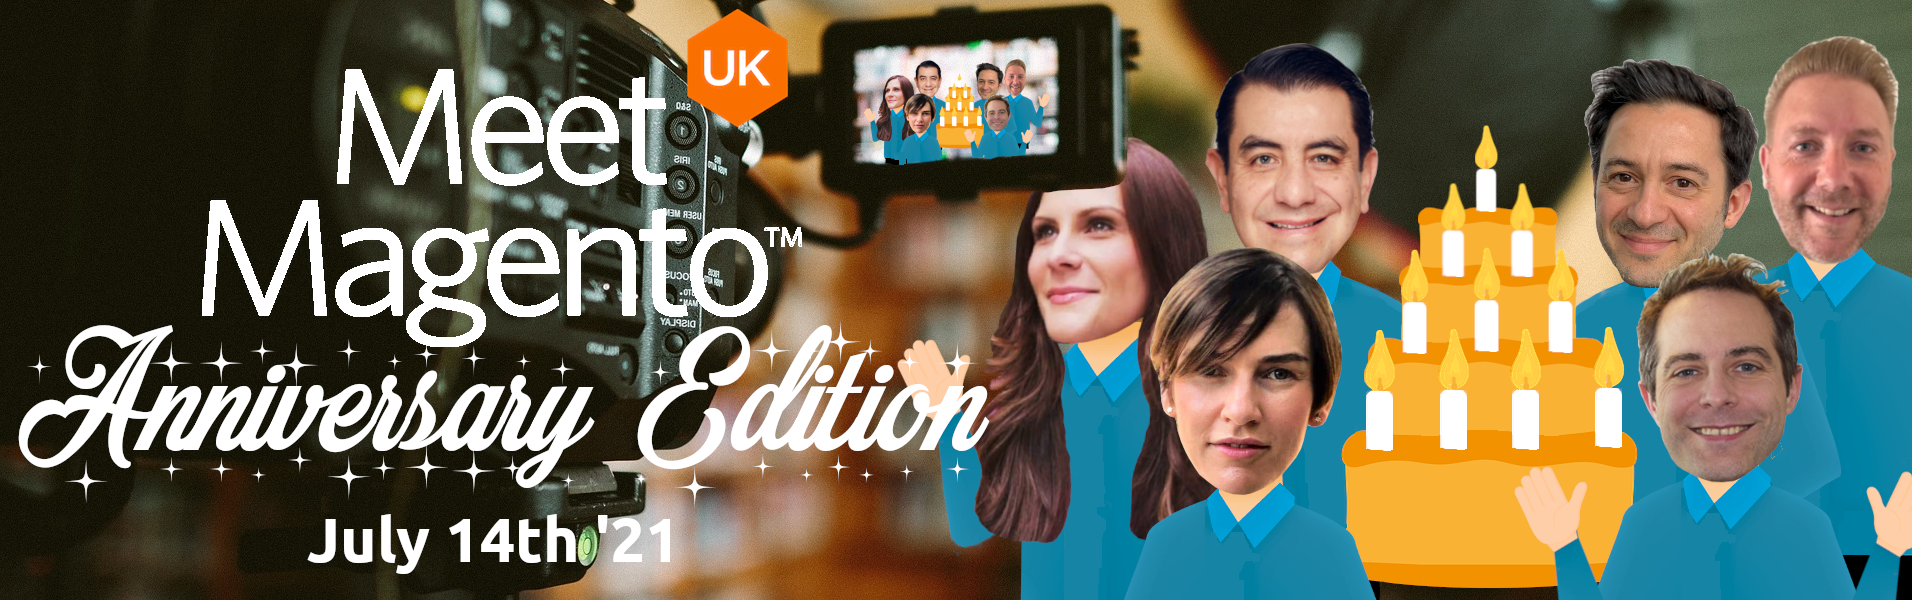 Meet Magento UK '21 - Alejandro Mondragon, Osvaldo Spadano, Vinai Kopp, Maša Prastalo, Brian Mapley & Olena Tkacheva.